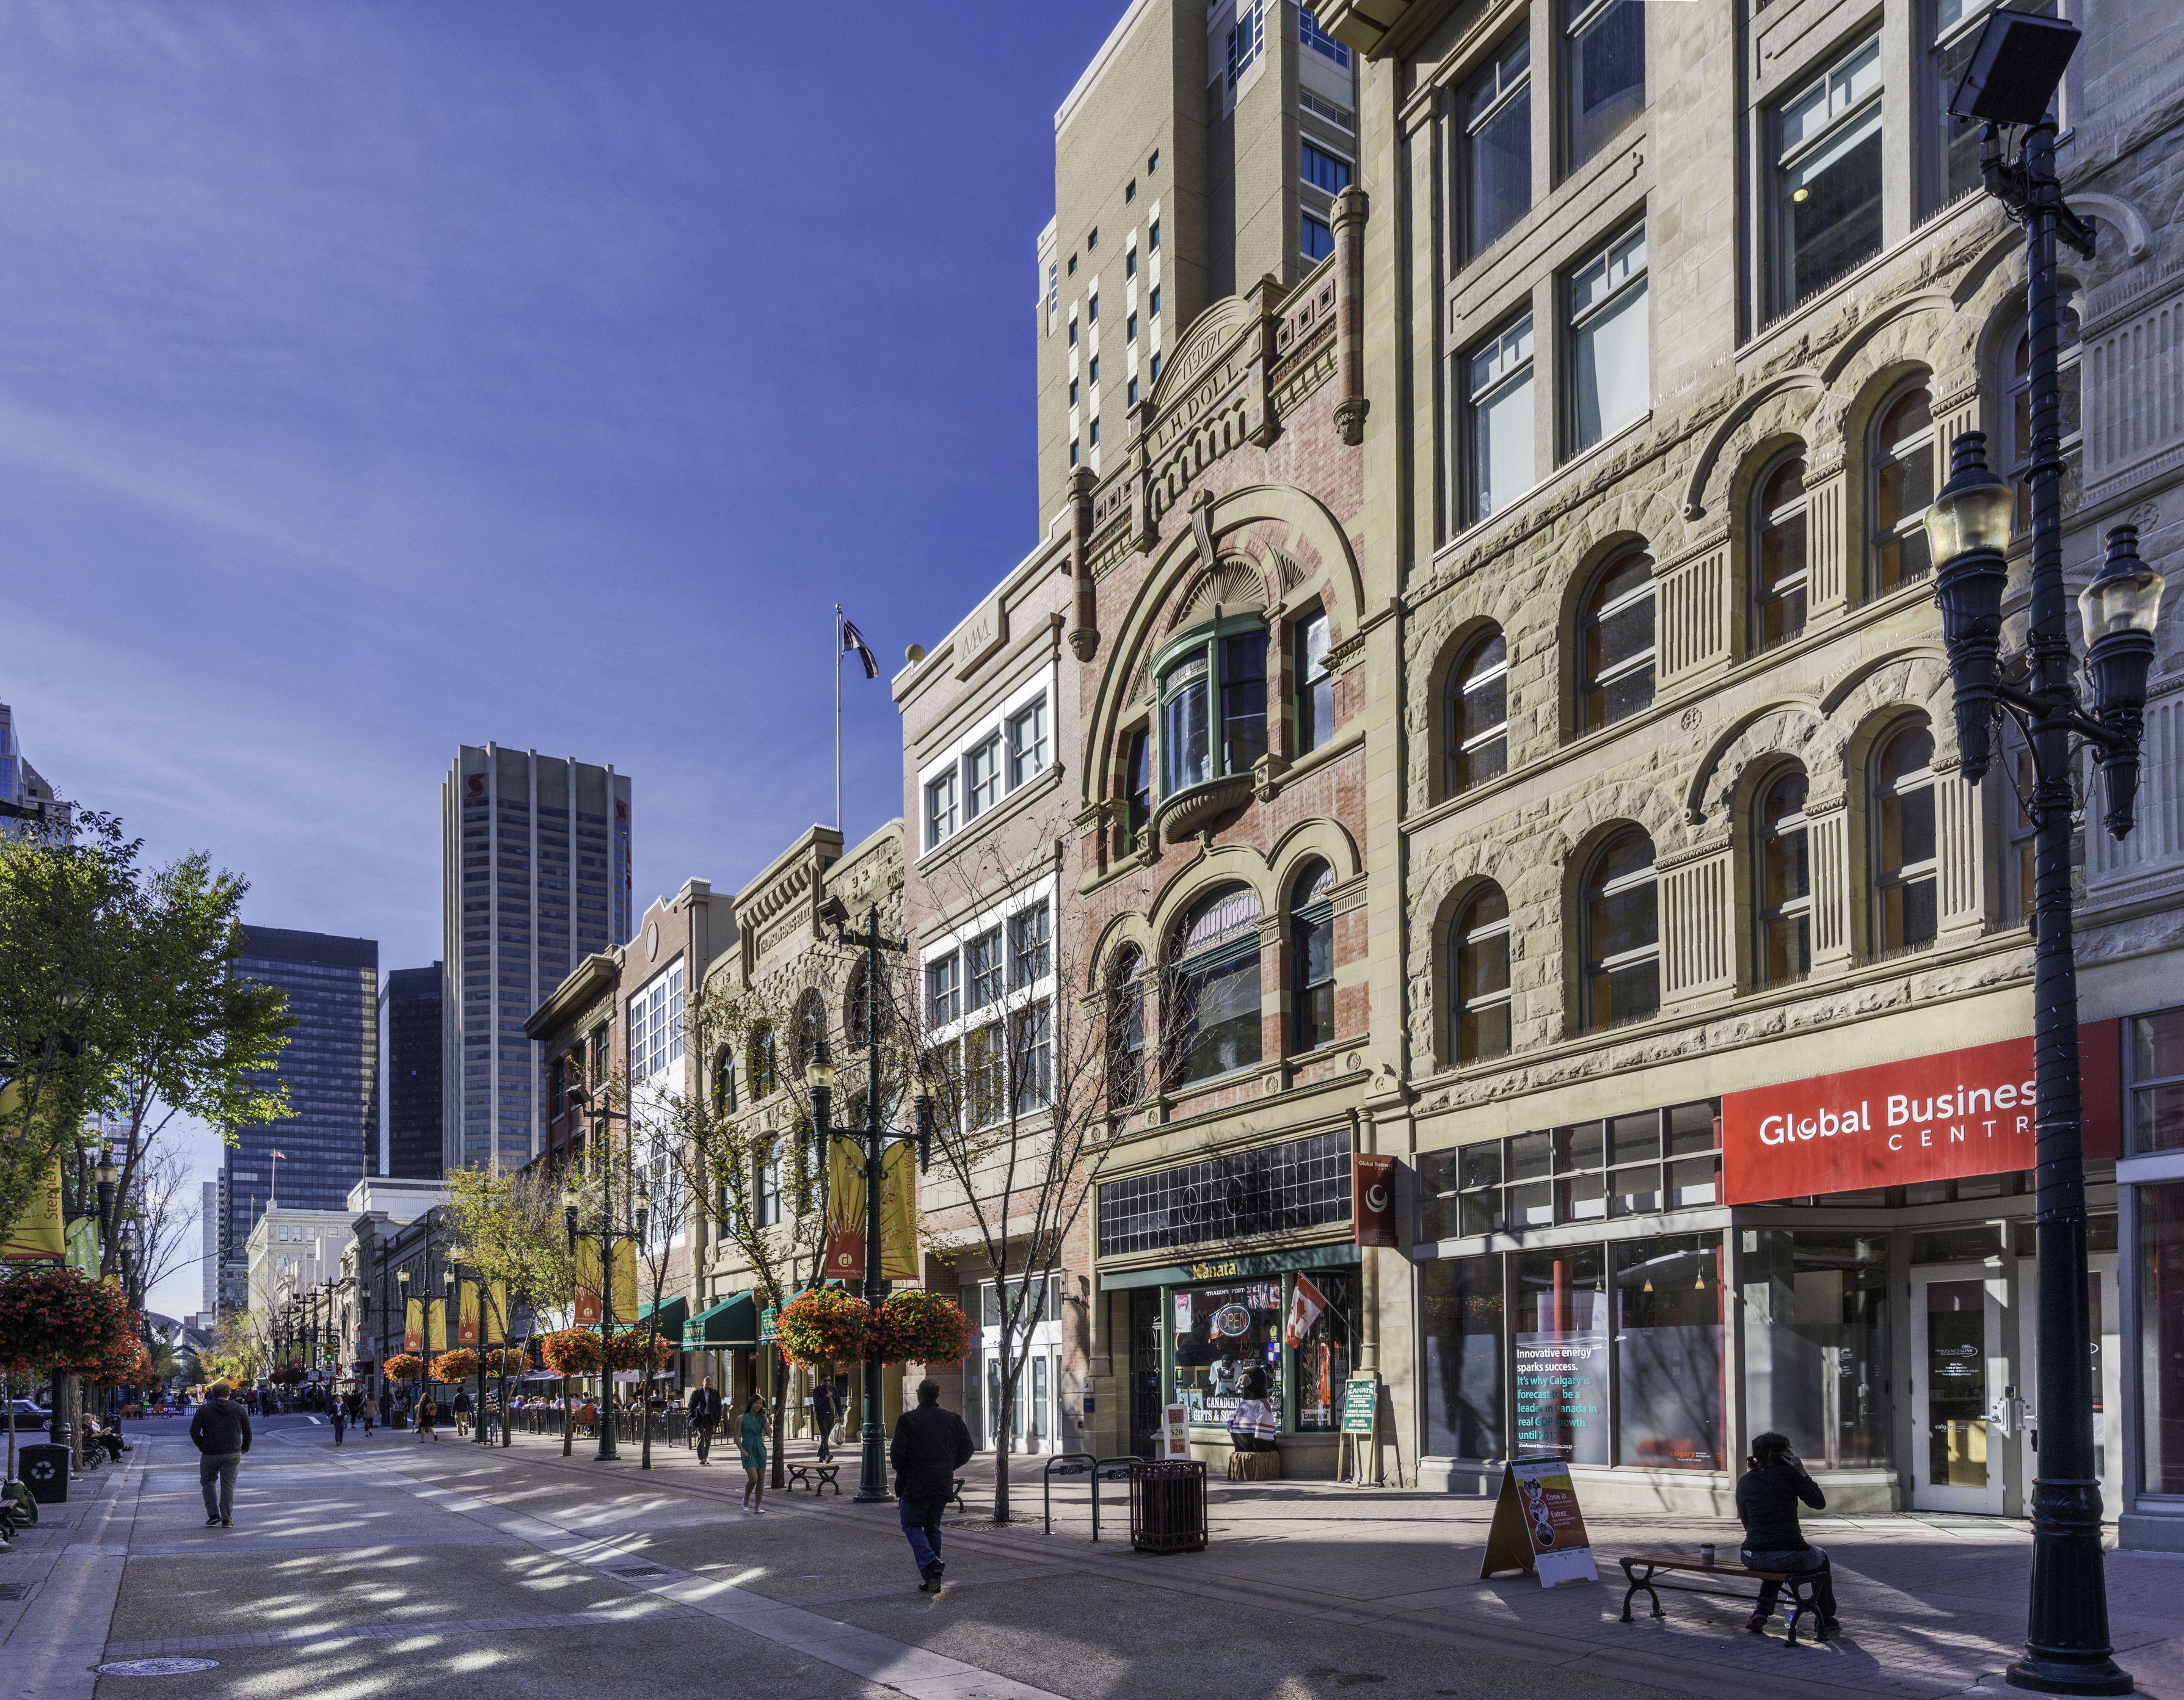 Stephen Avenue, downtown Calgary, Alberta, Canada